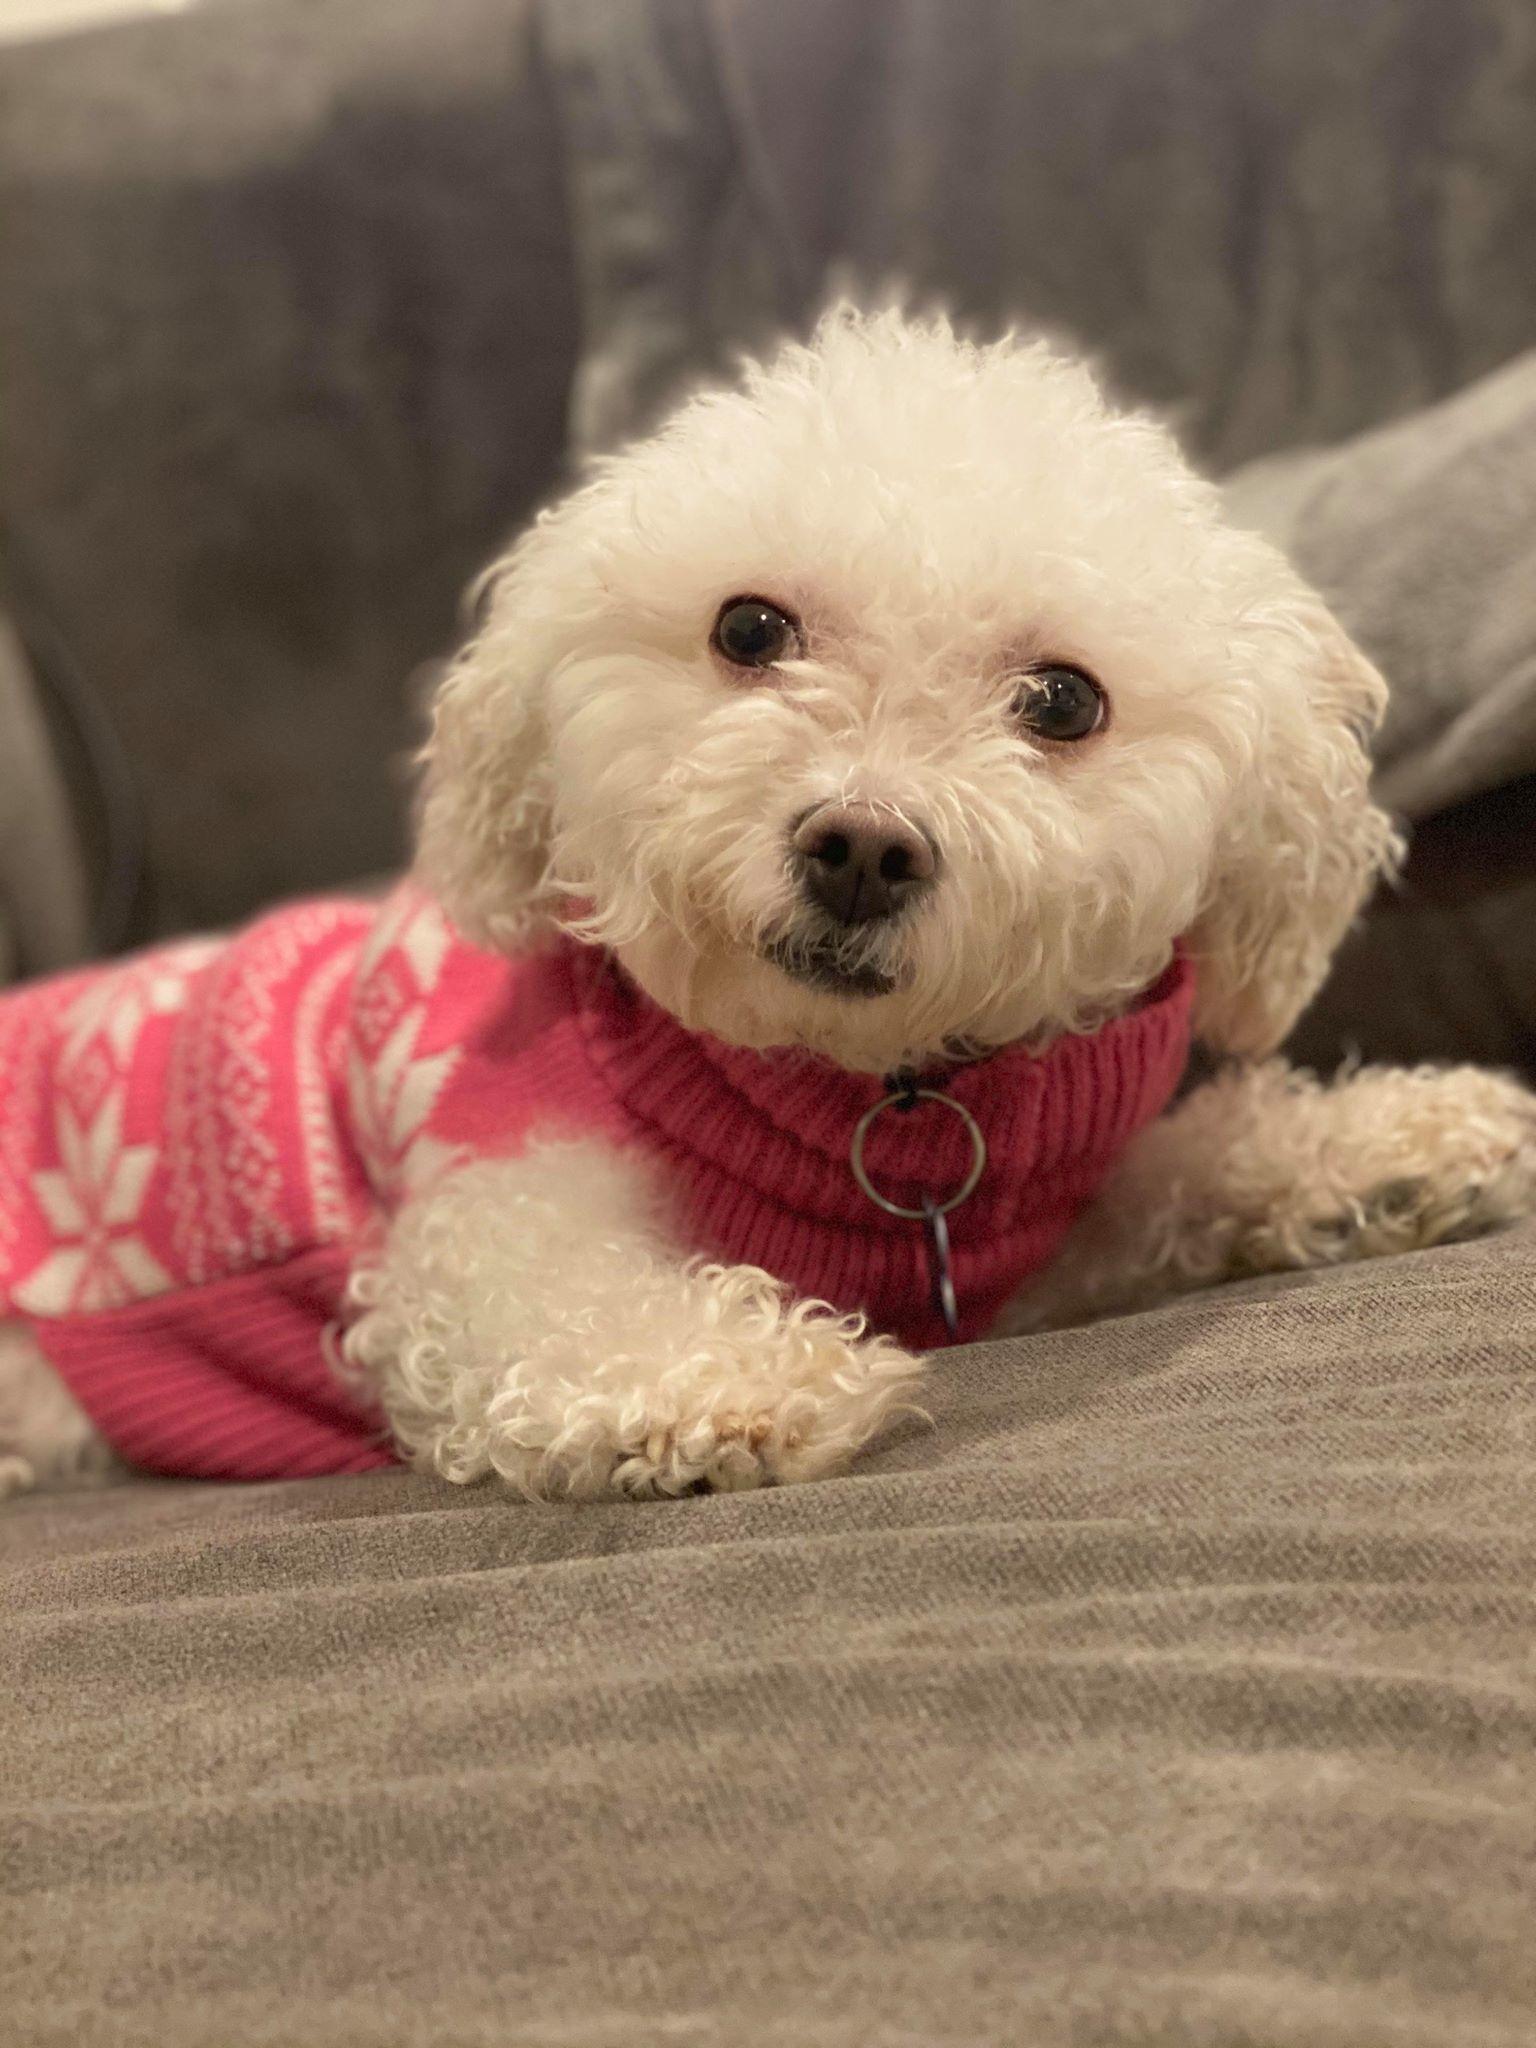 Dog for adoption - Neena, a Miniature Poodle & Bichon Frise